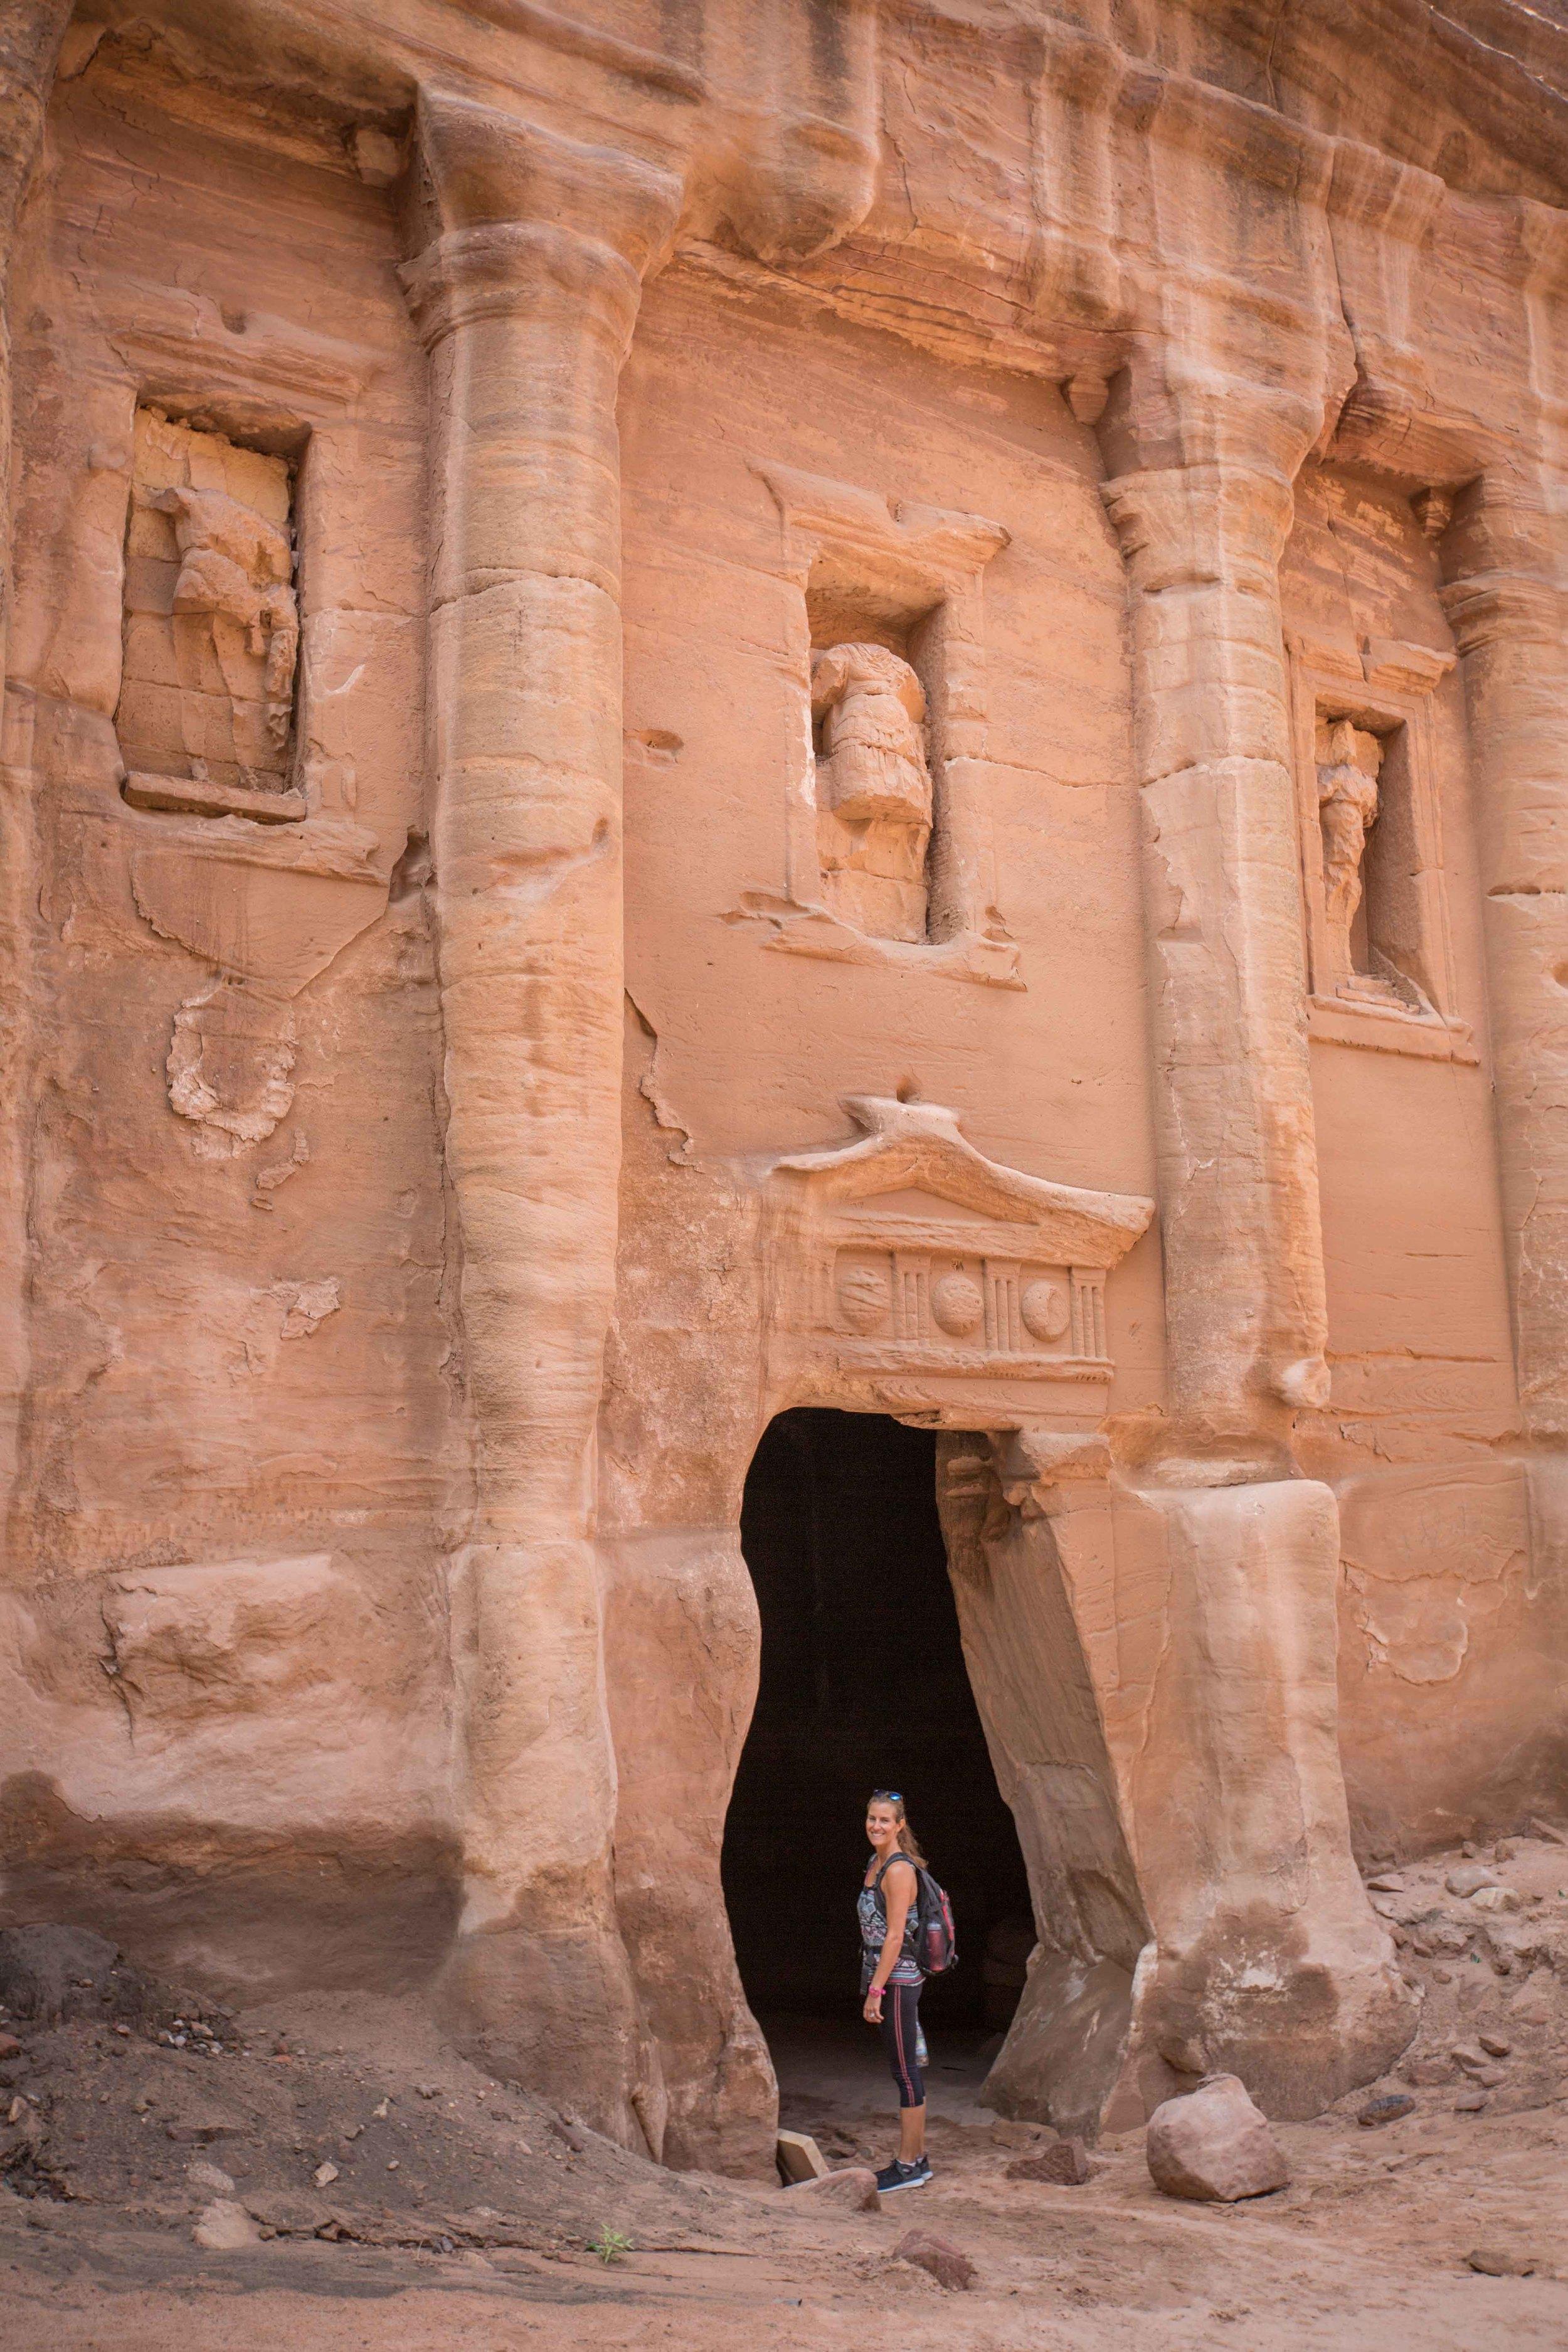 Roman soldier tomb petra